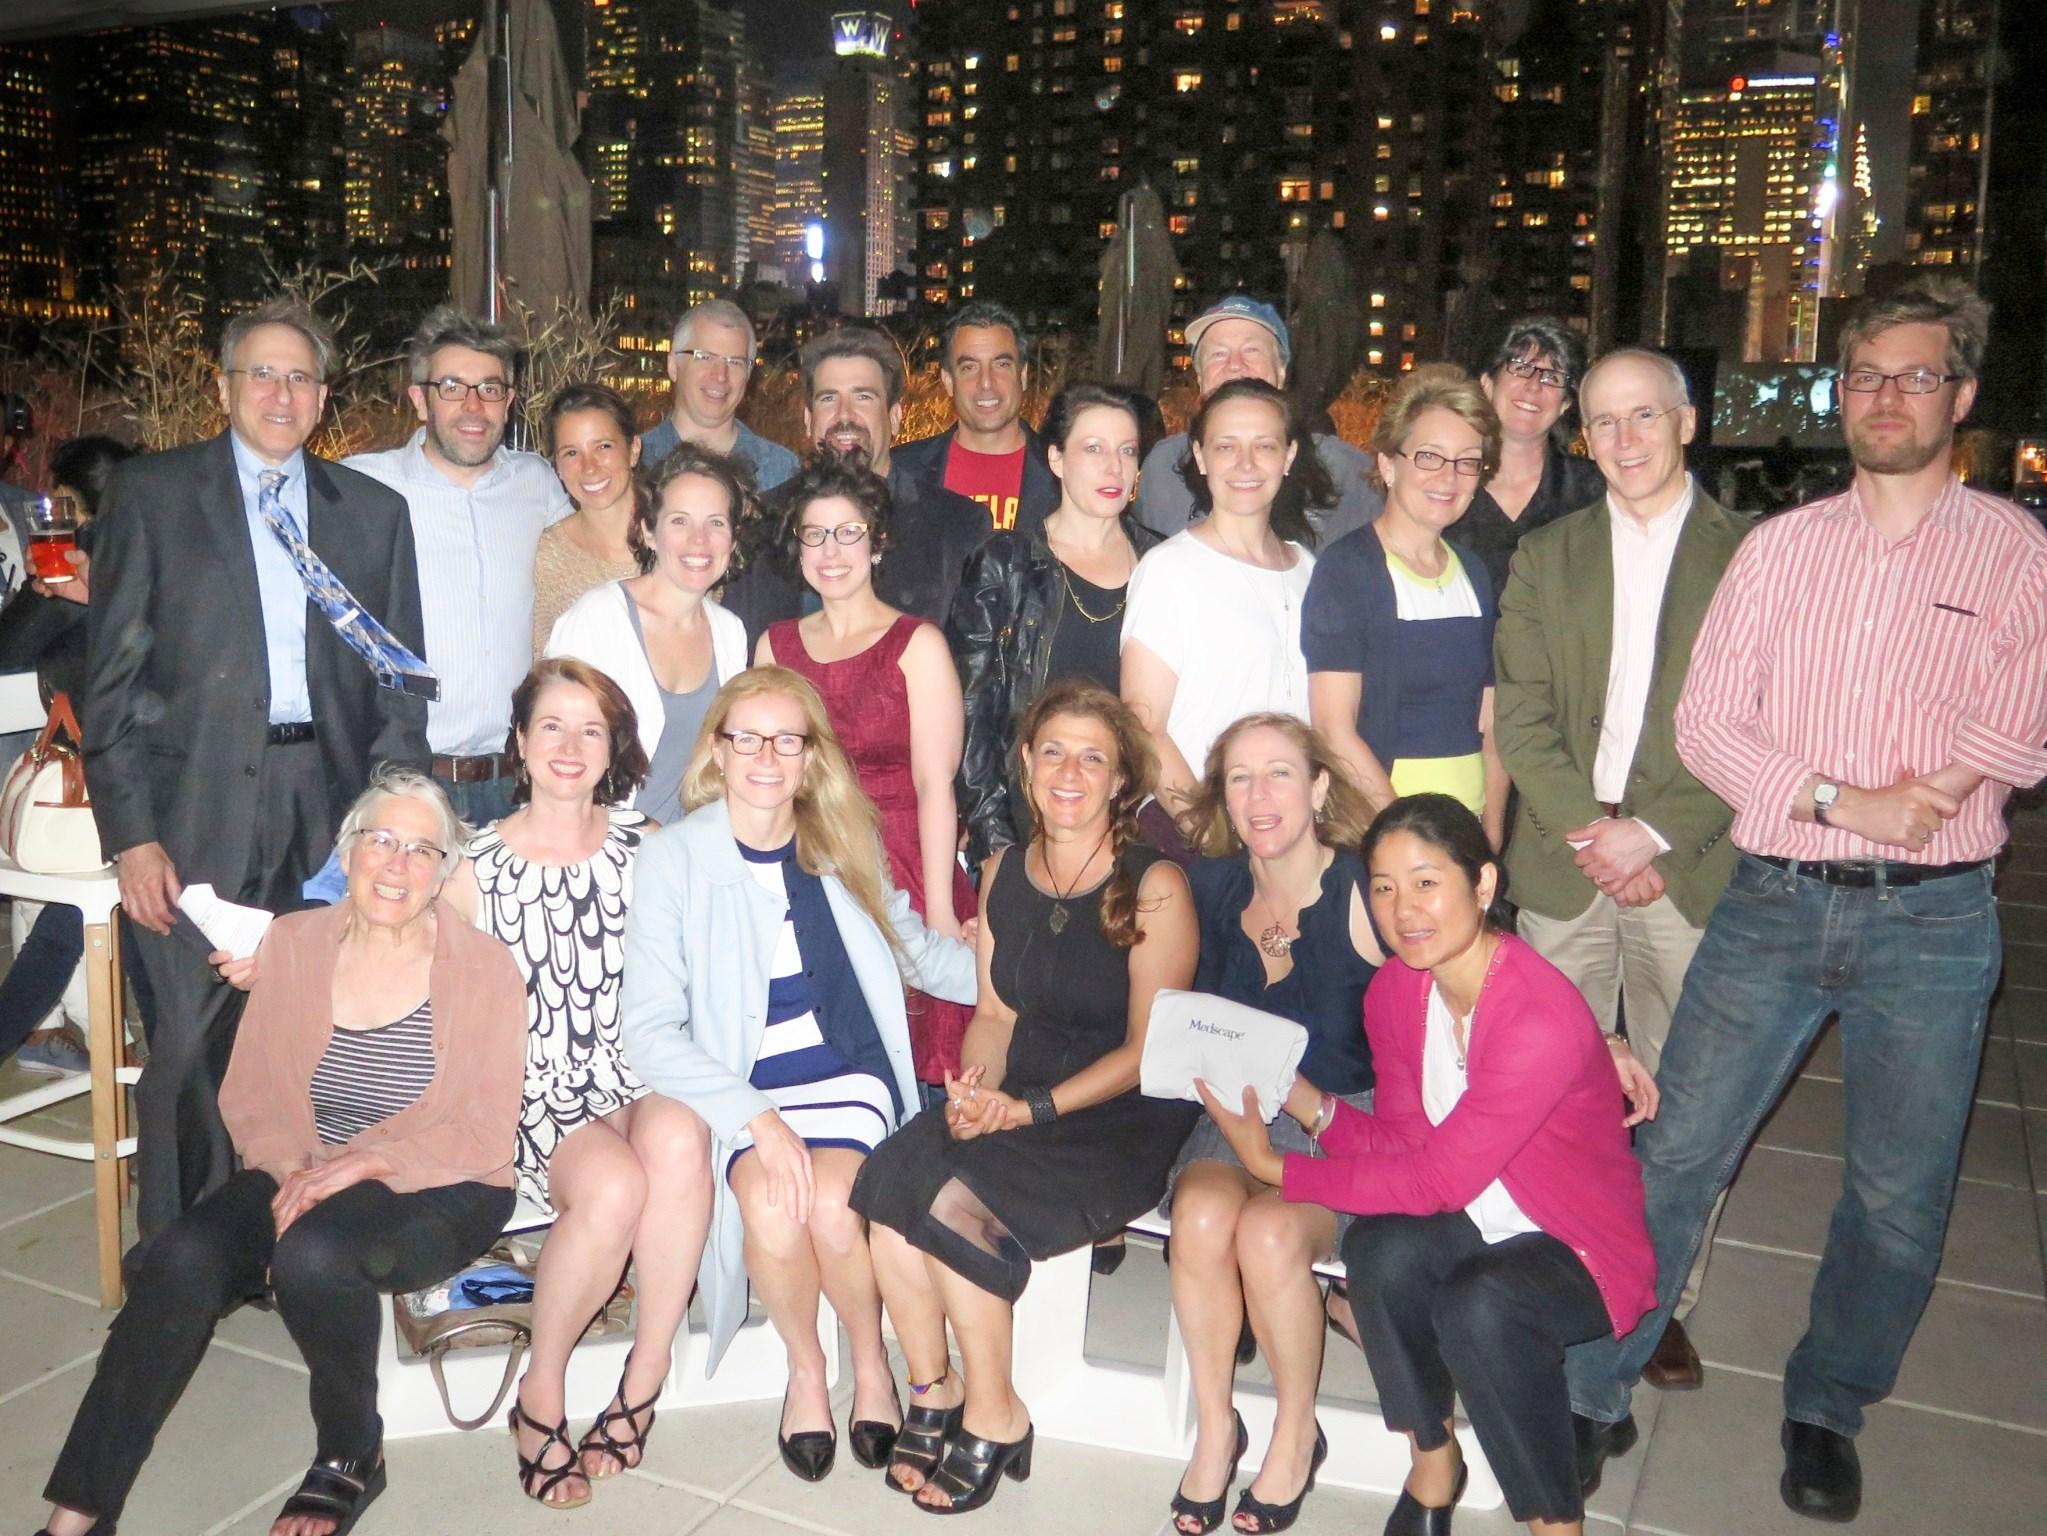 Medscape's 20th anniversary